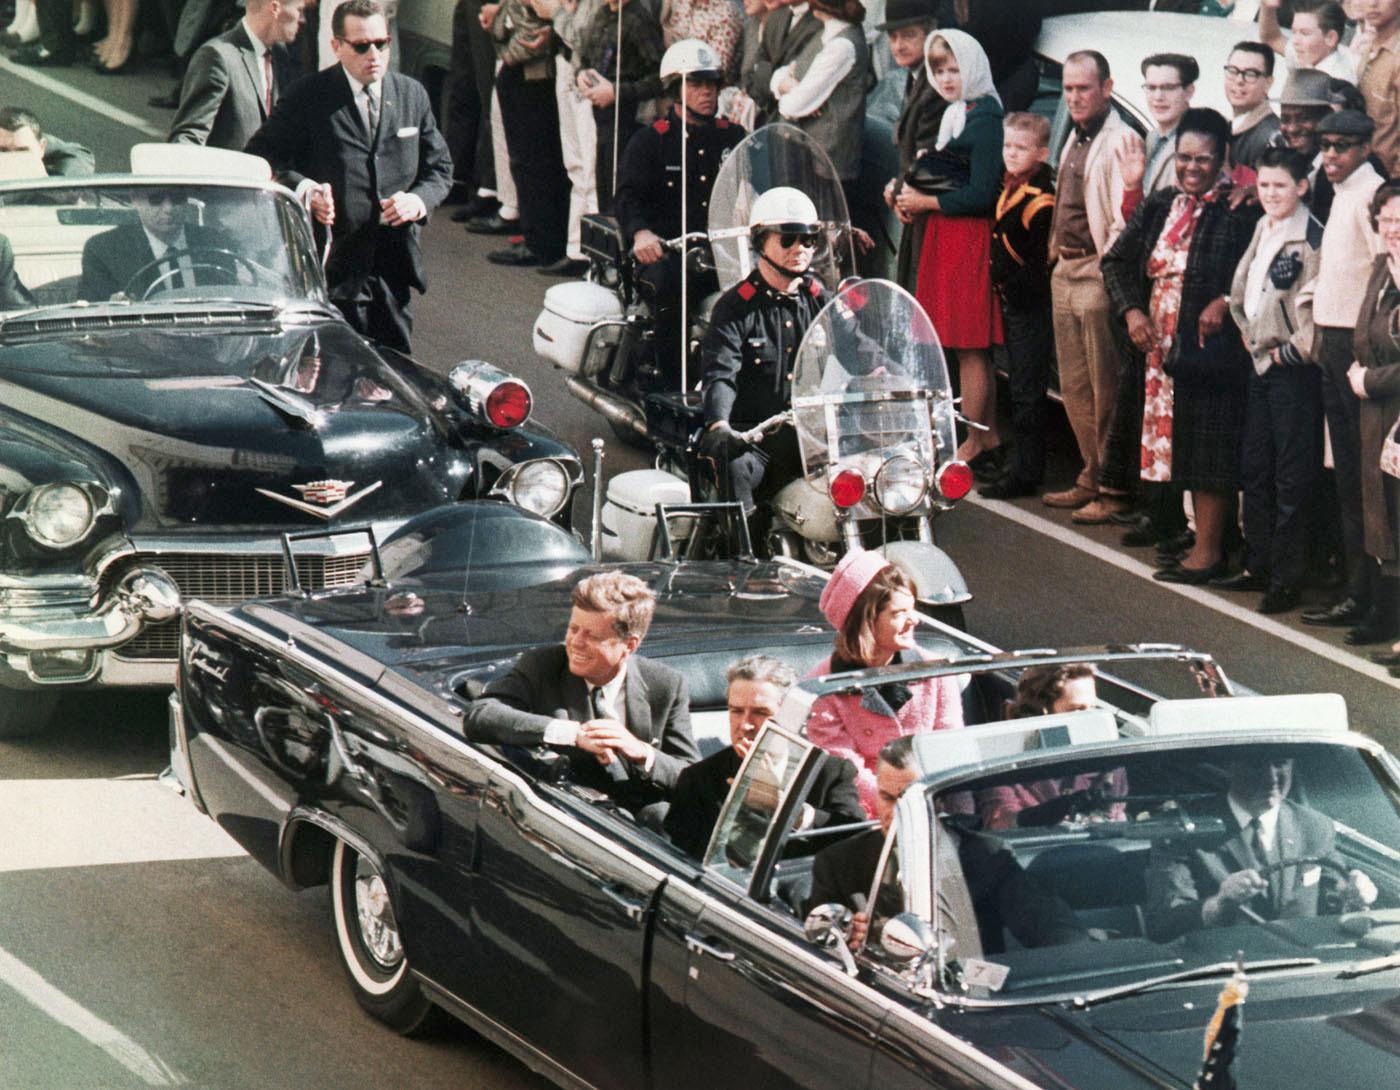 Image: President John F. Kennedy's motorcade in Dallas